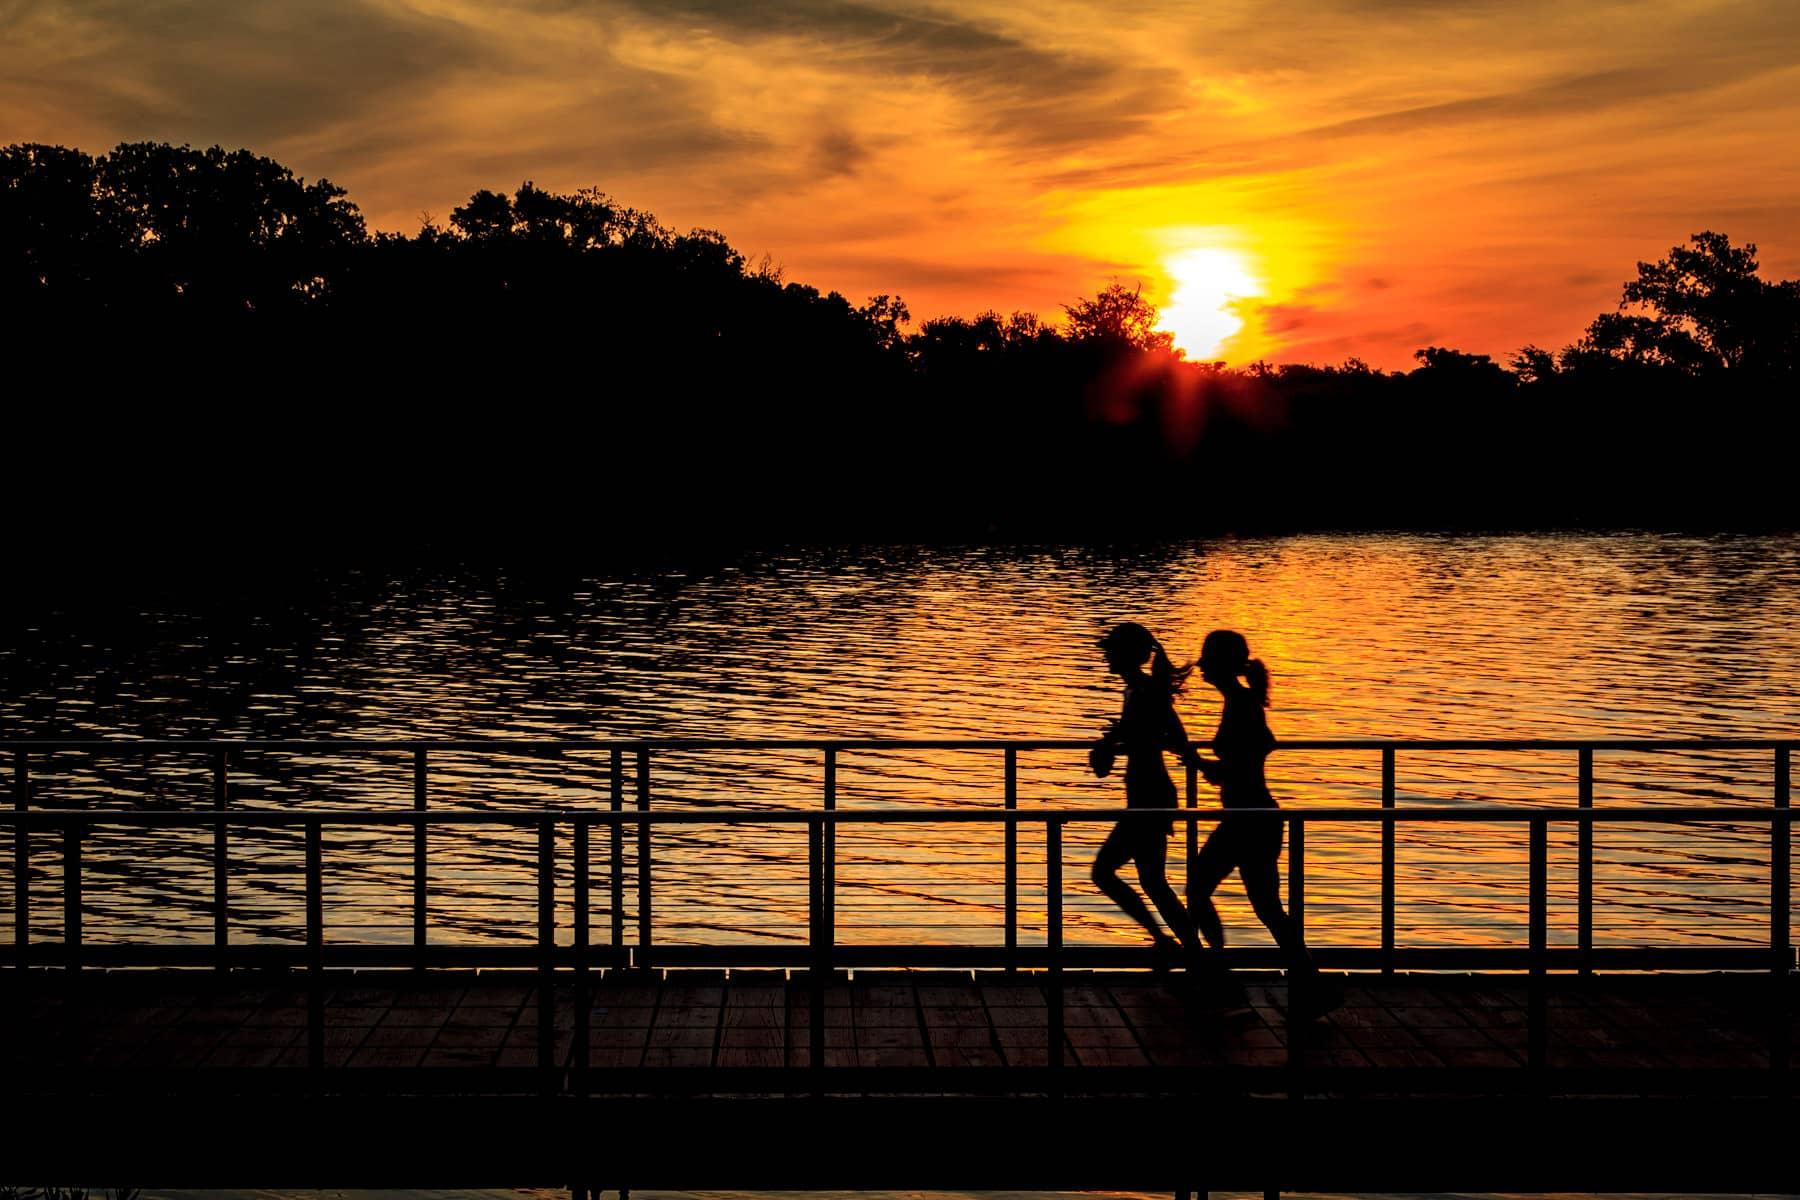 Joggers run along a footbridge as the sun rises over White Rock Lake, Dallas.